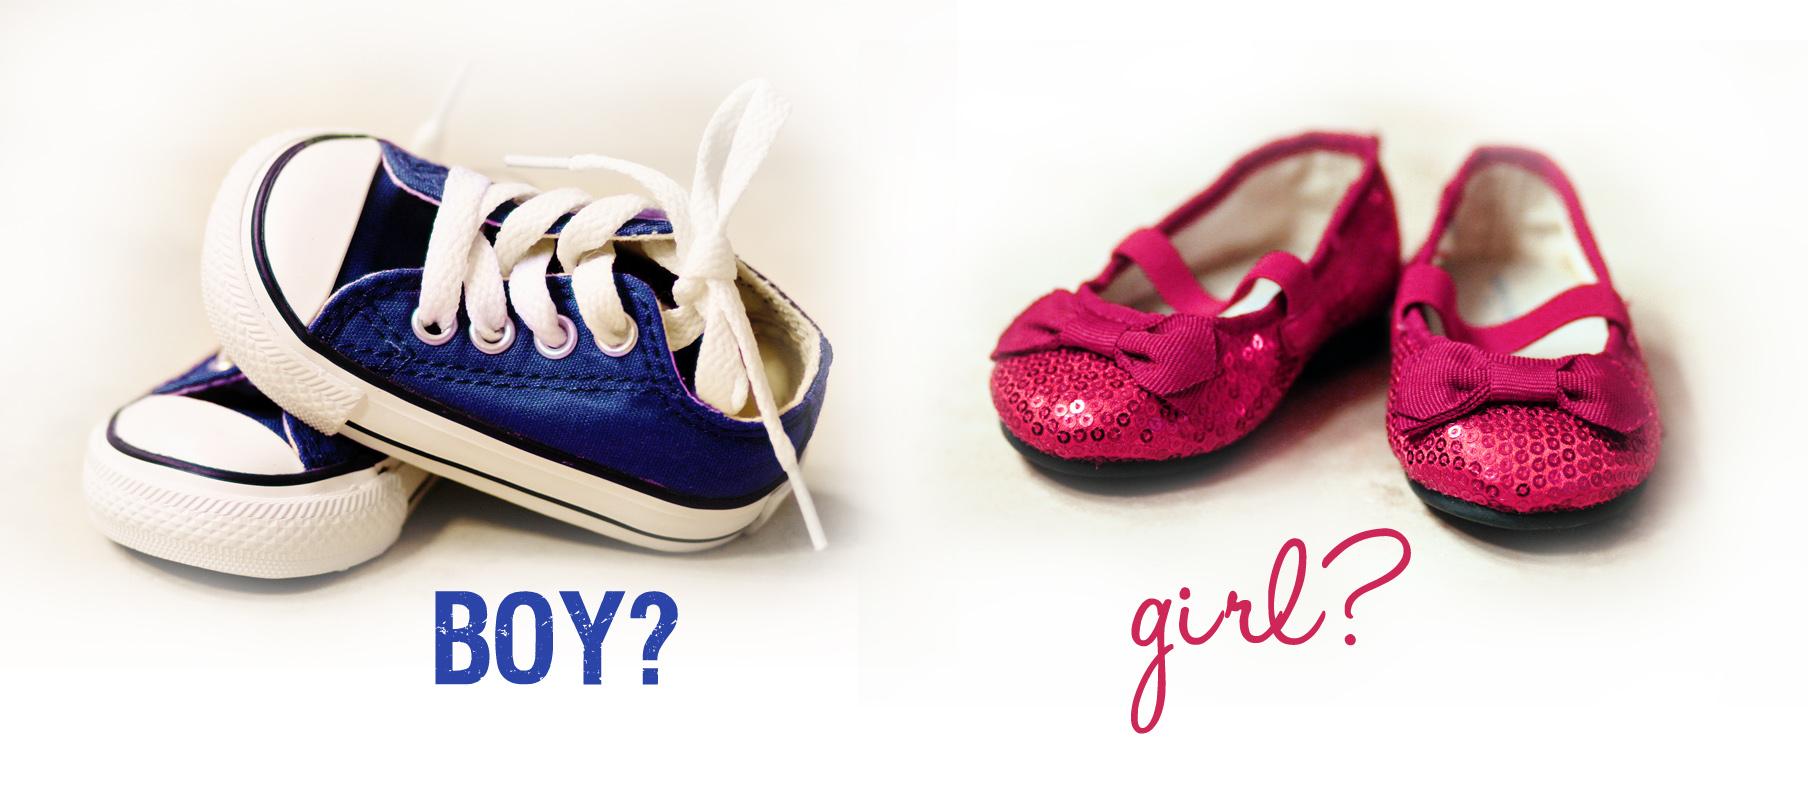 boy-or-girl1